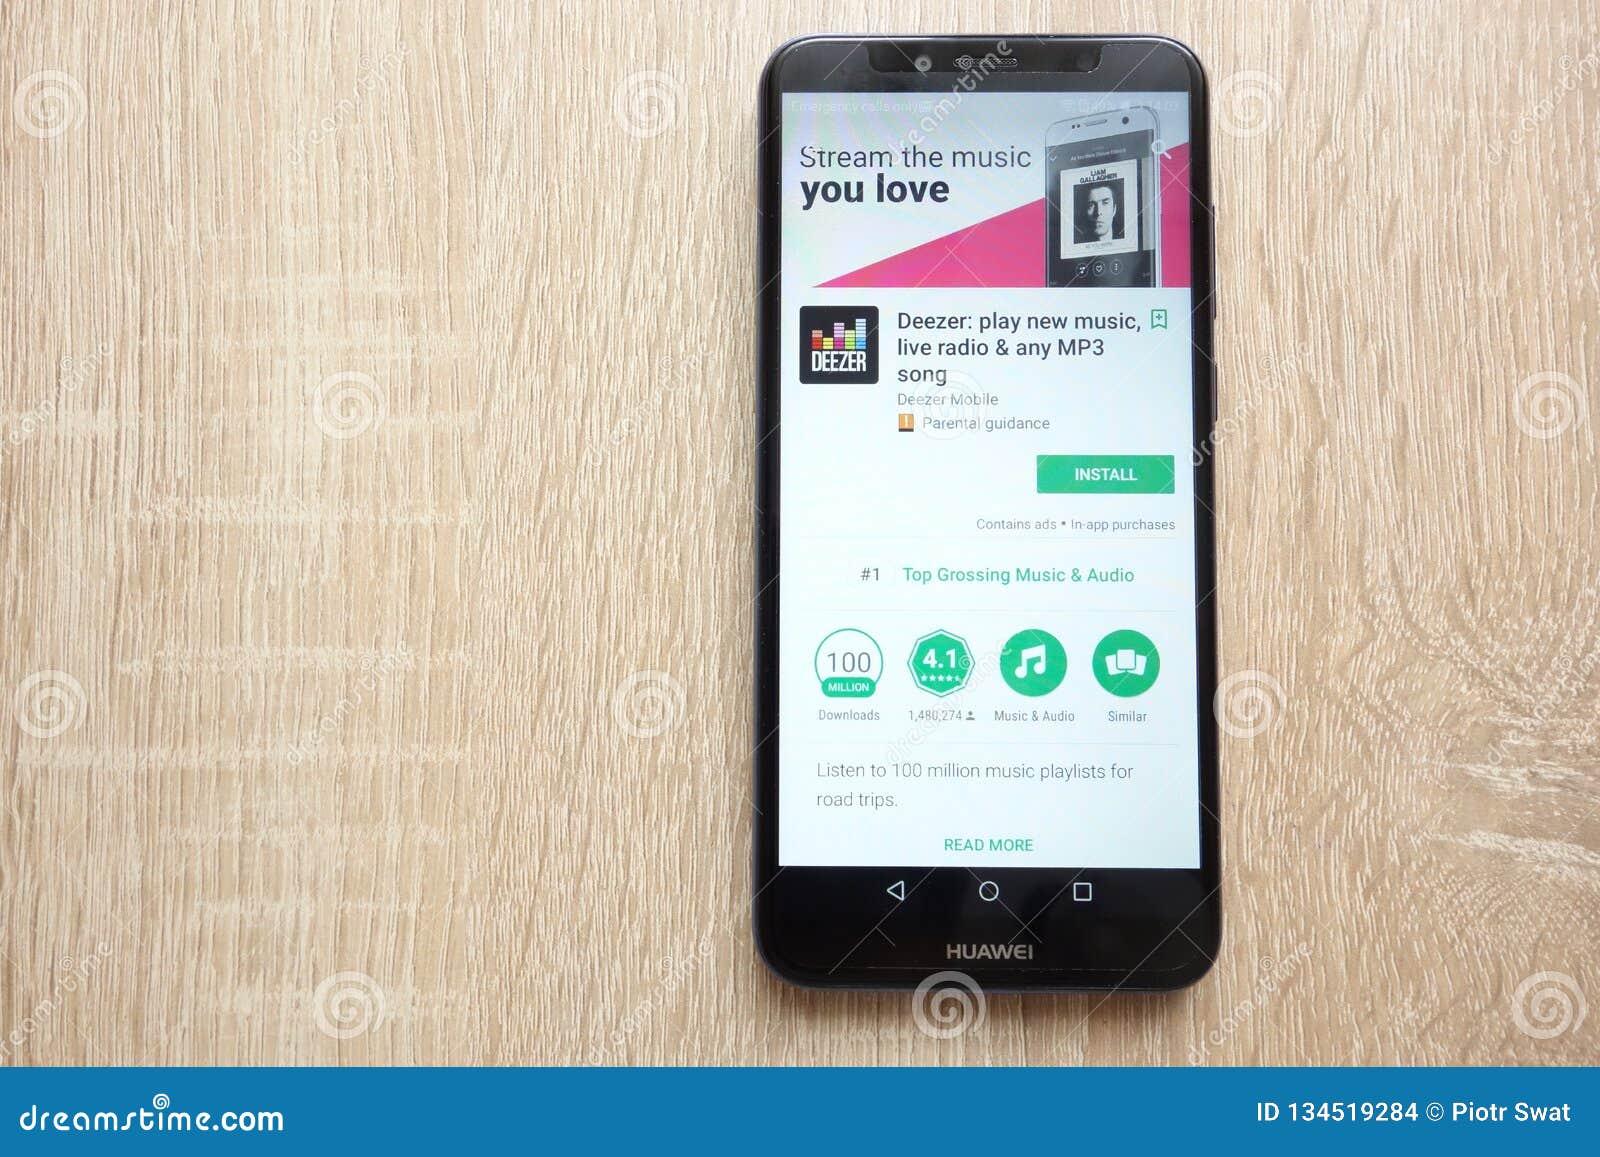 Deezer App On Google Play Store Website Displayed On Huawei